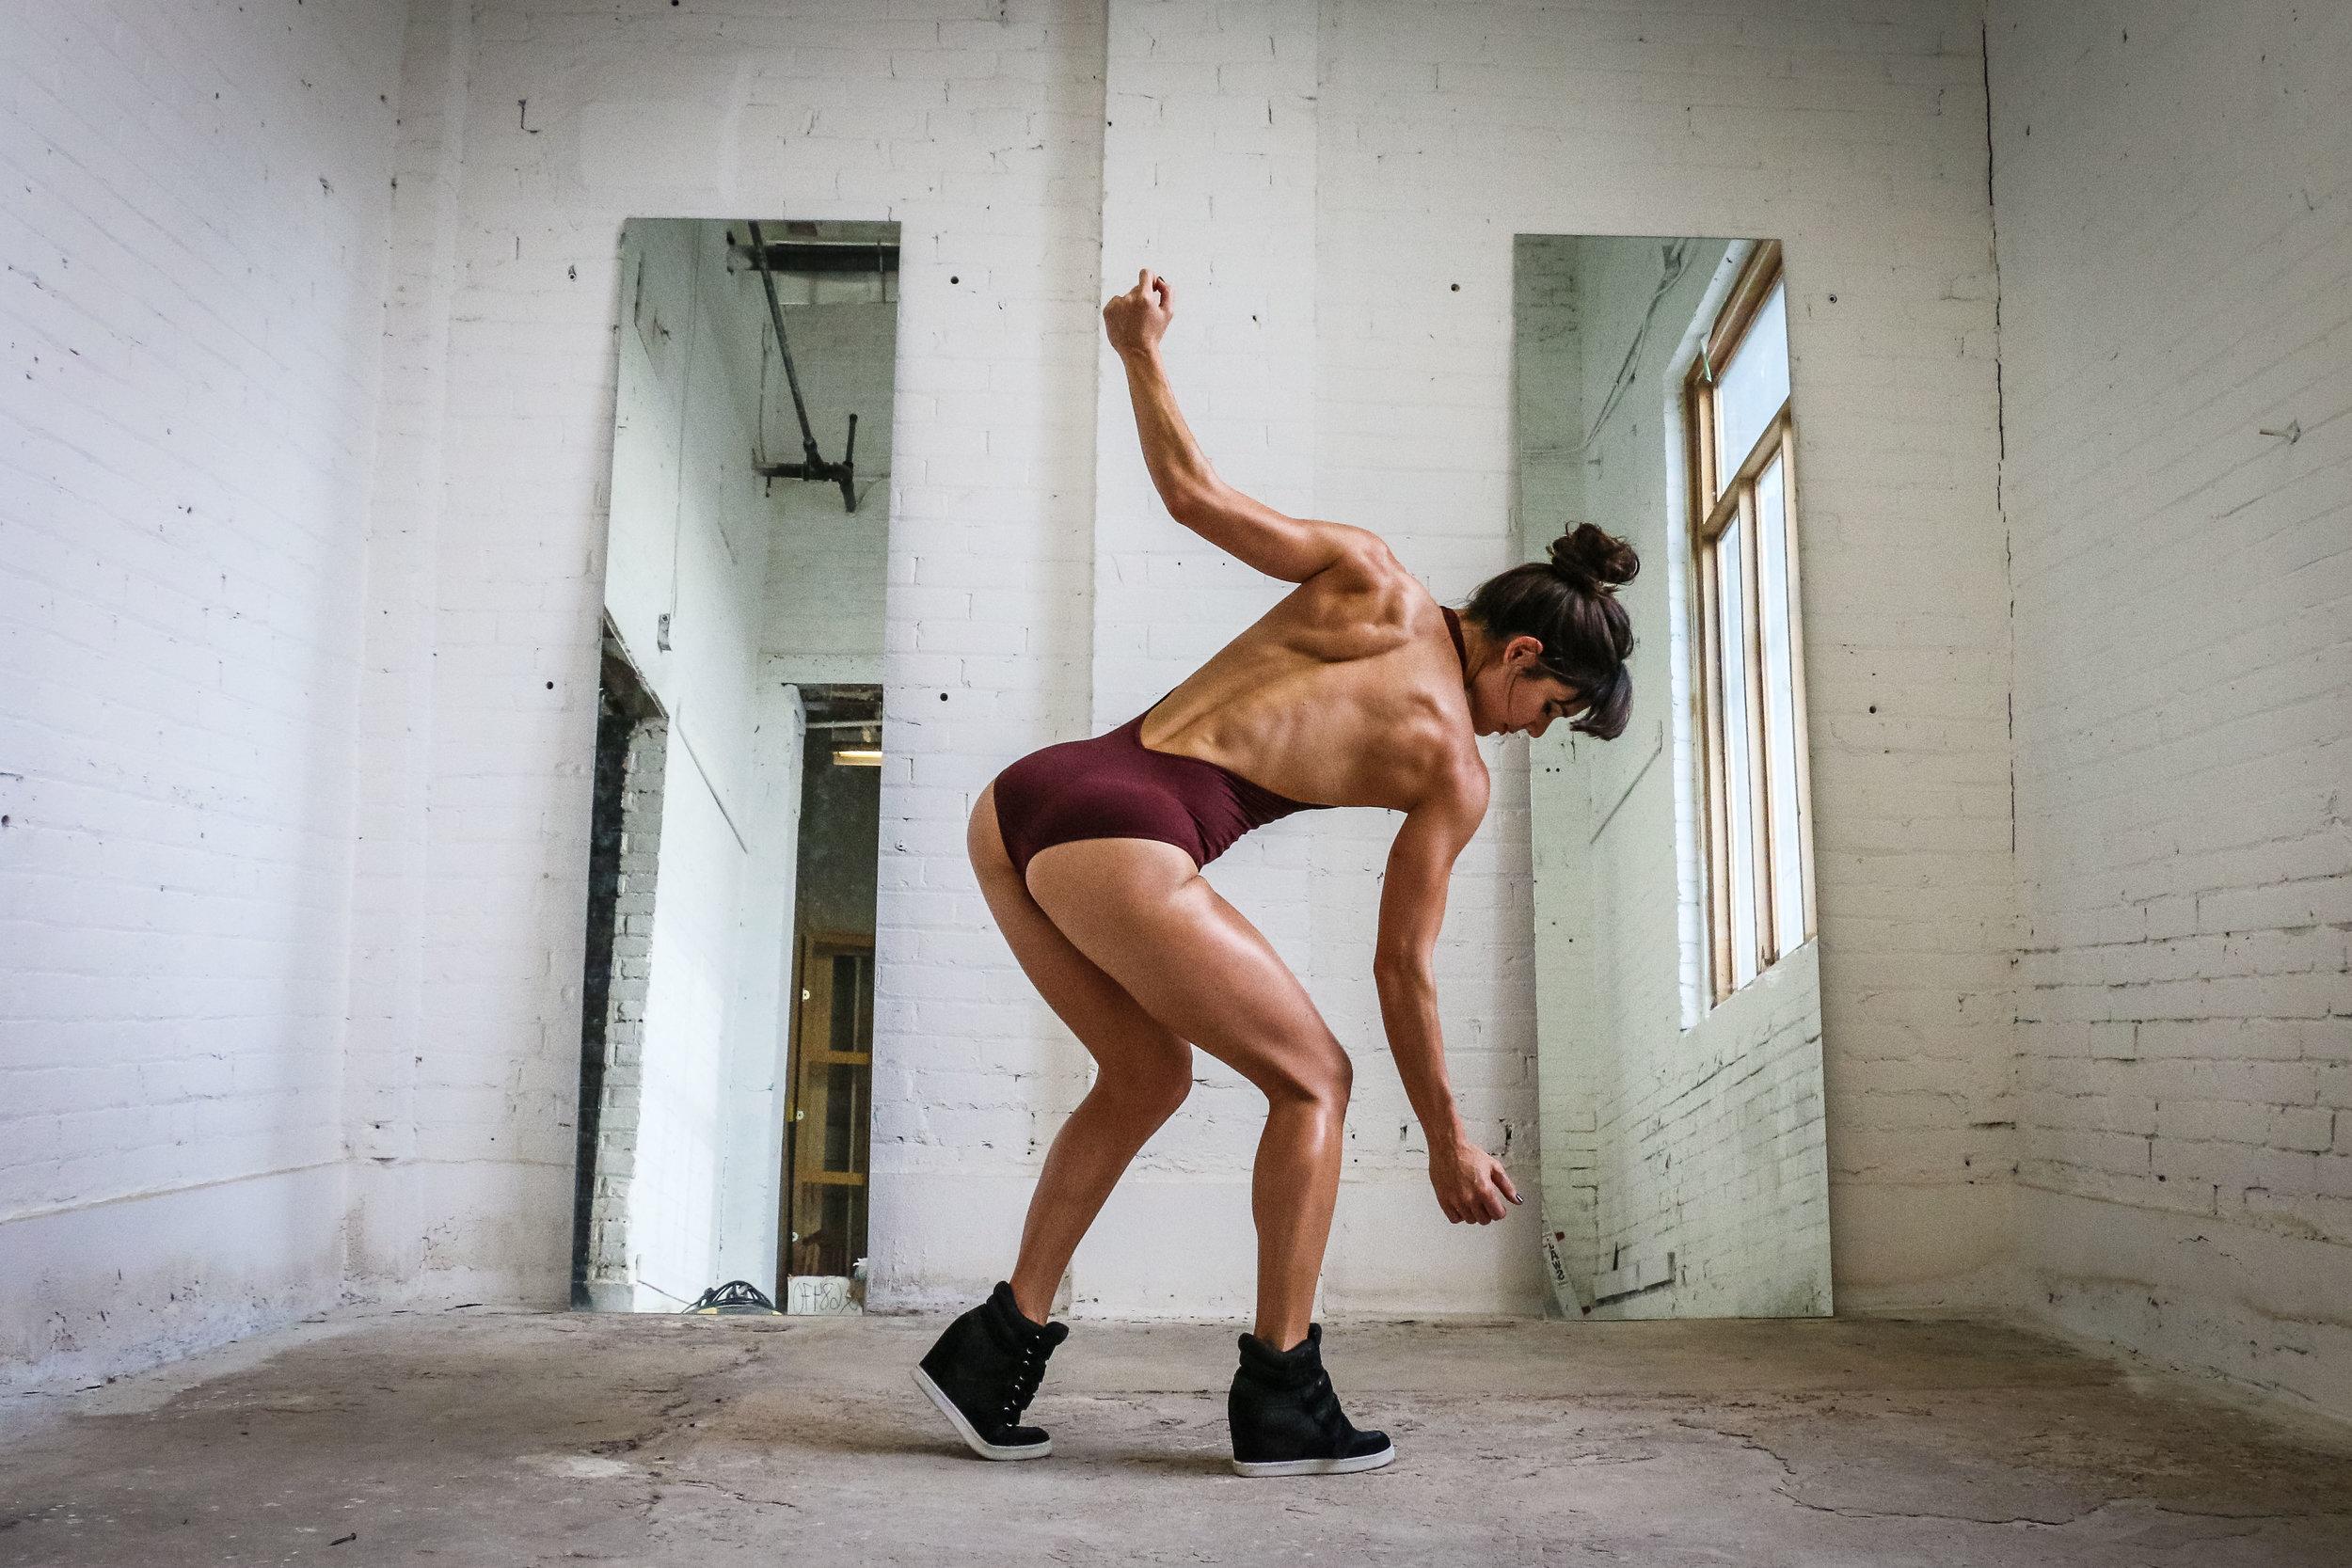 Pursuit OCR, Back Muscles, Fitness Model, Butt, Fitness Inspiration, Bodysuit, Pursuit Toronto